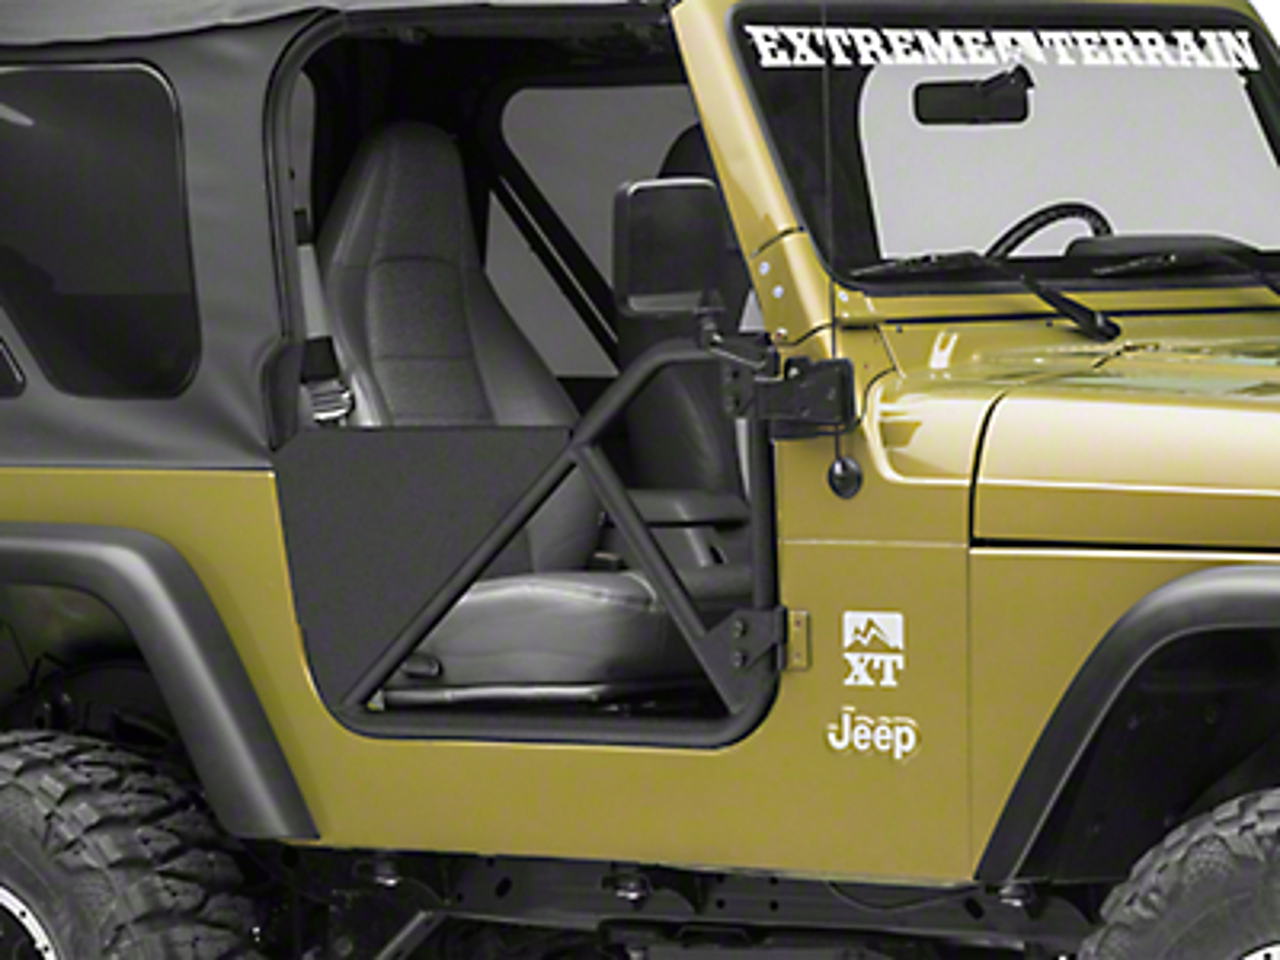 Smittybilt SRC Tubular Doors - Front - Black Textured (97-06 Wrangler TJ)